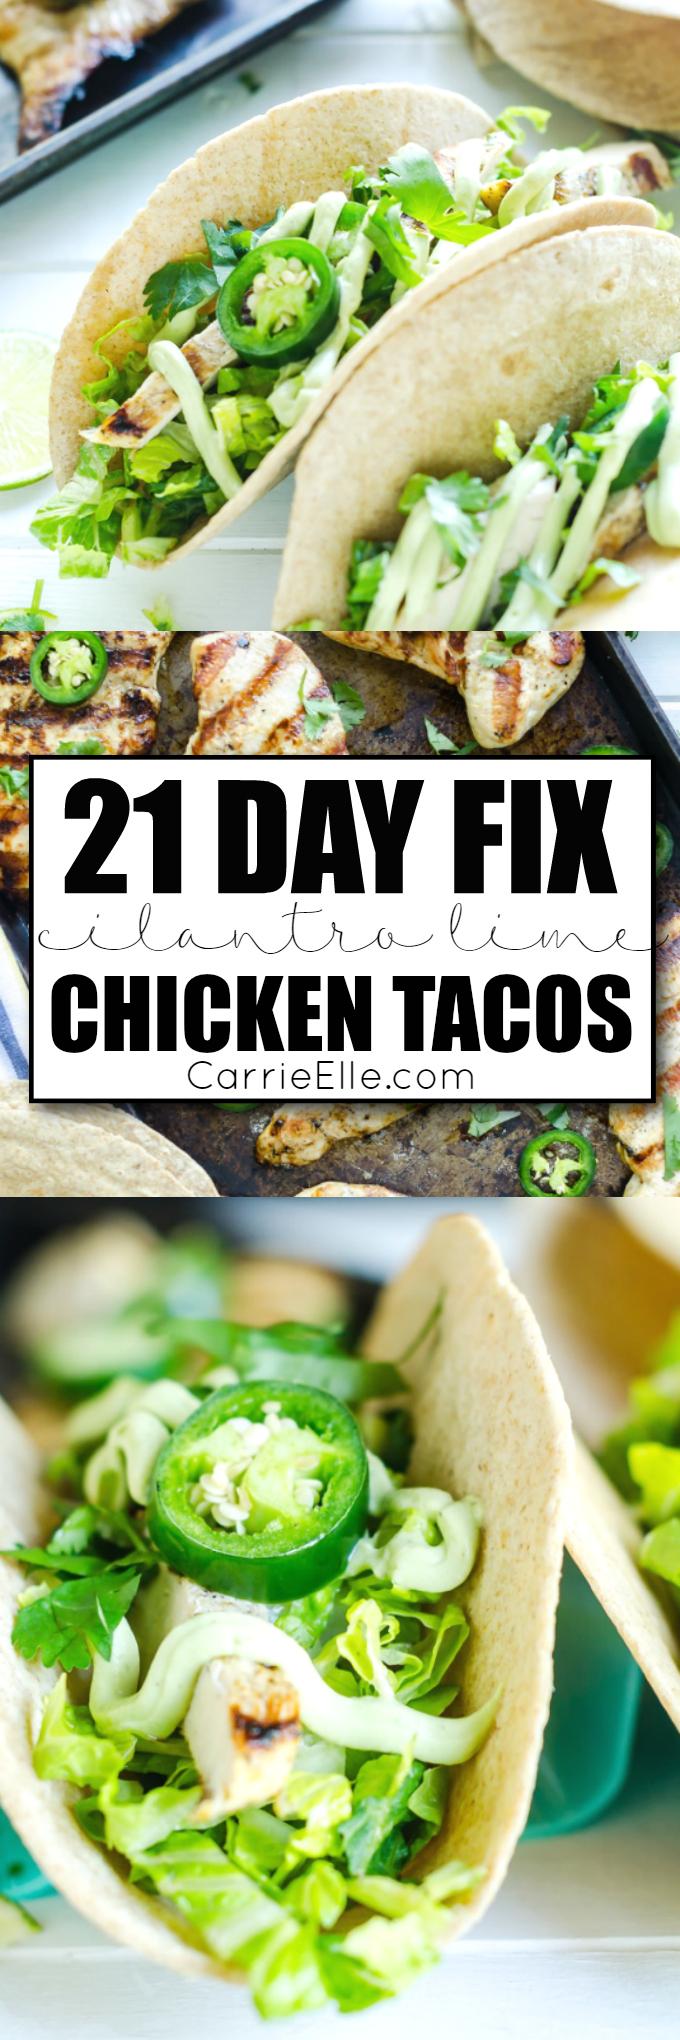 21 Day Fix Chicken Tacos